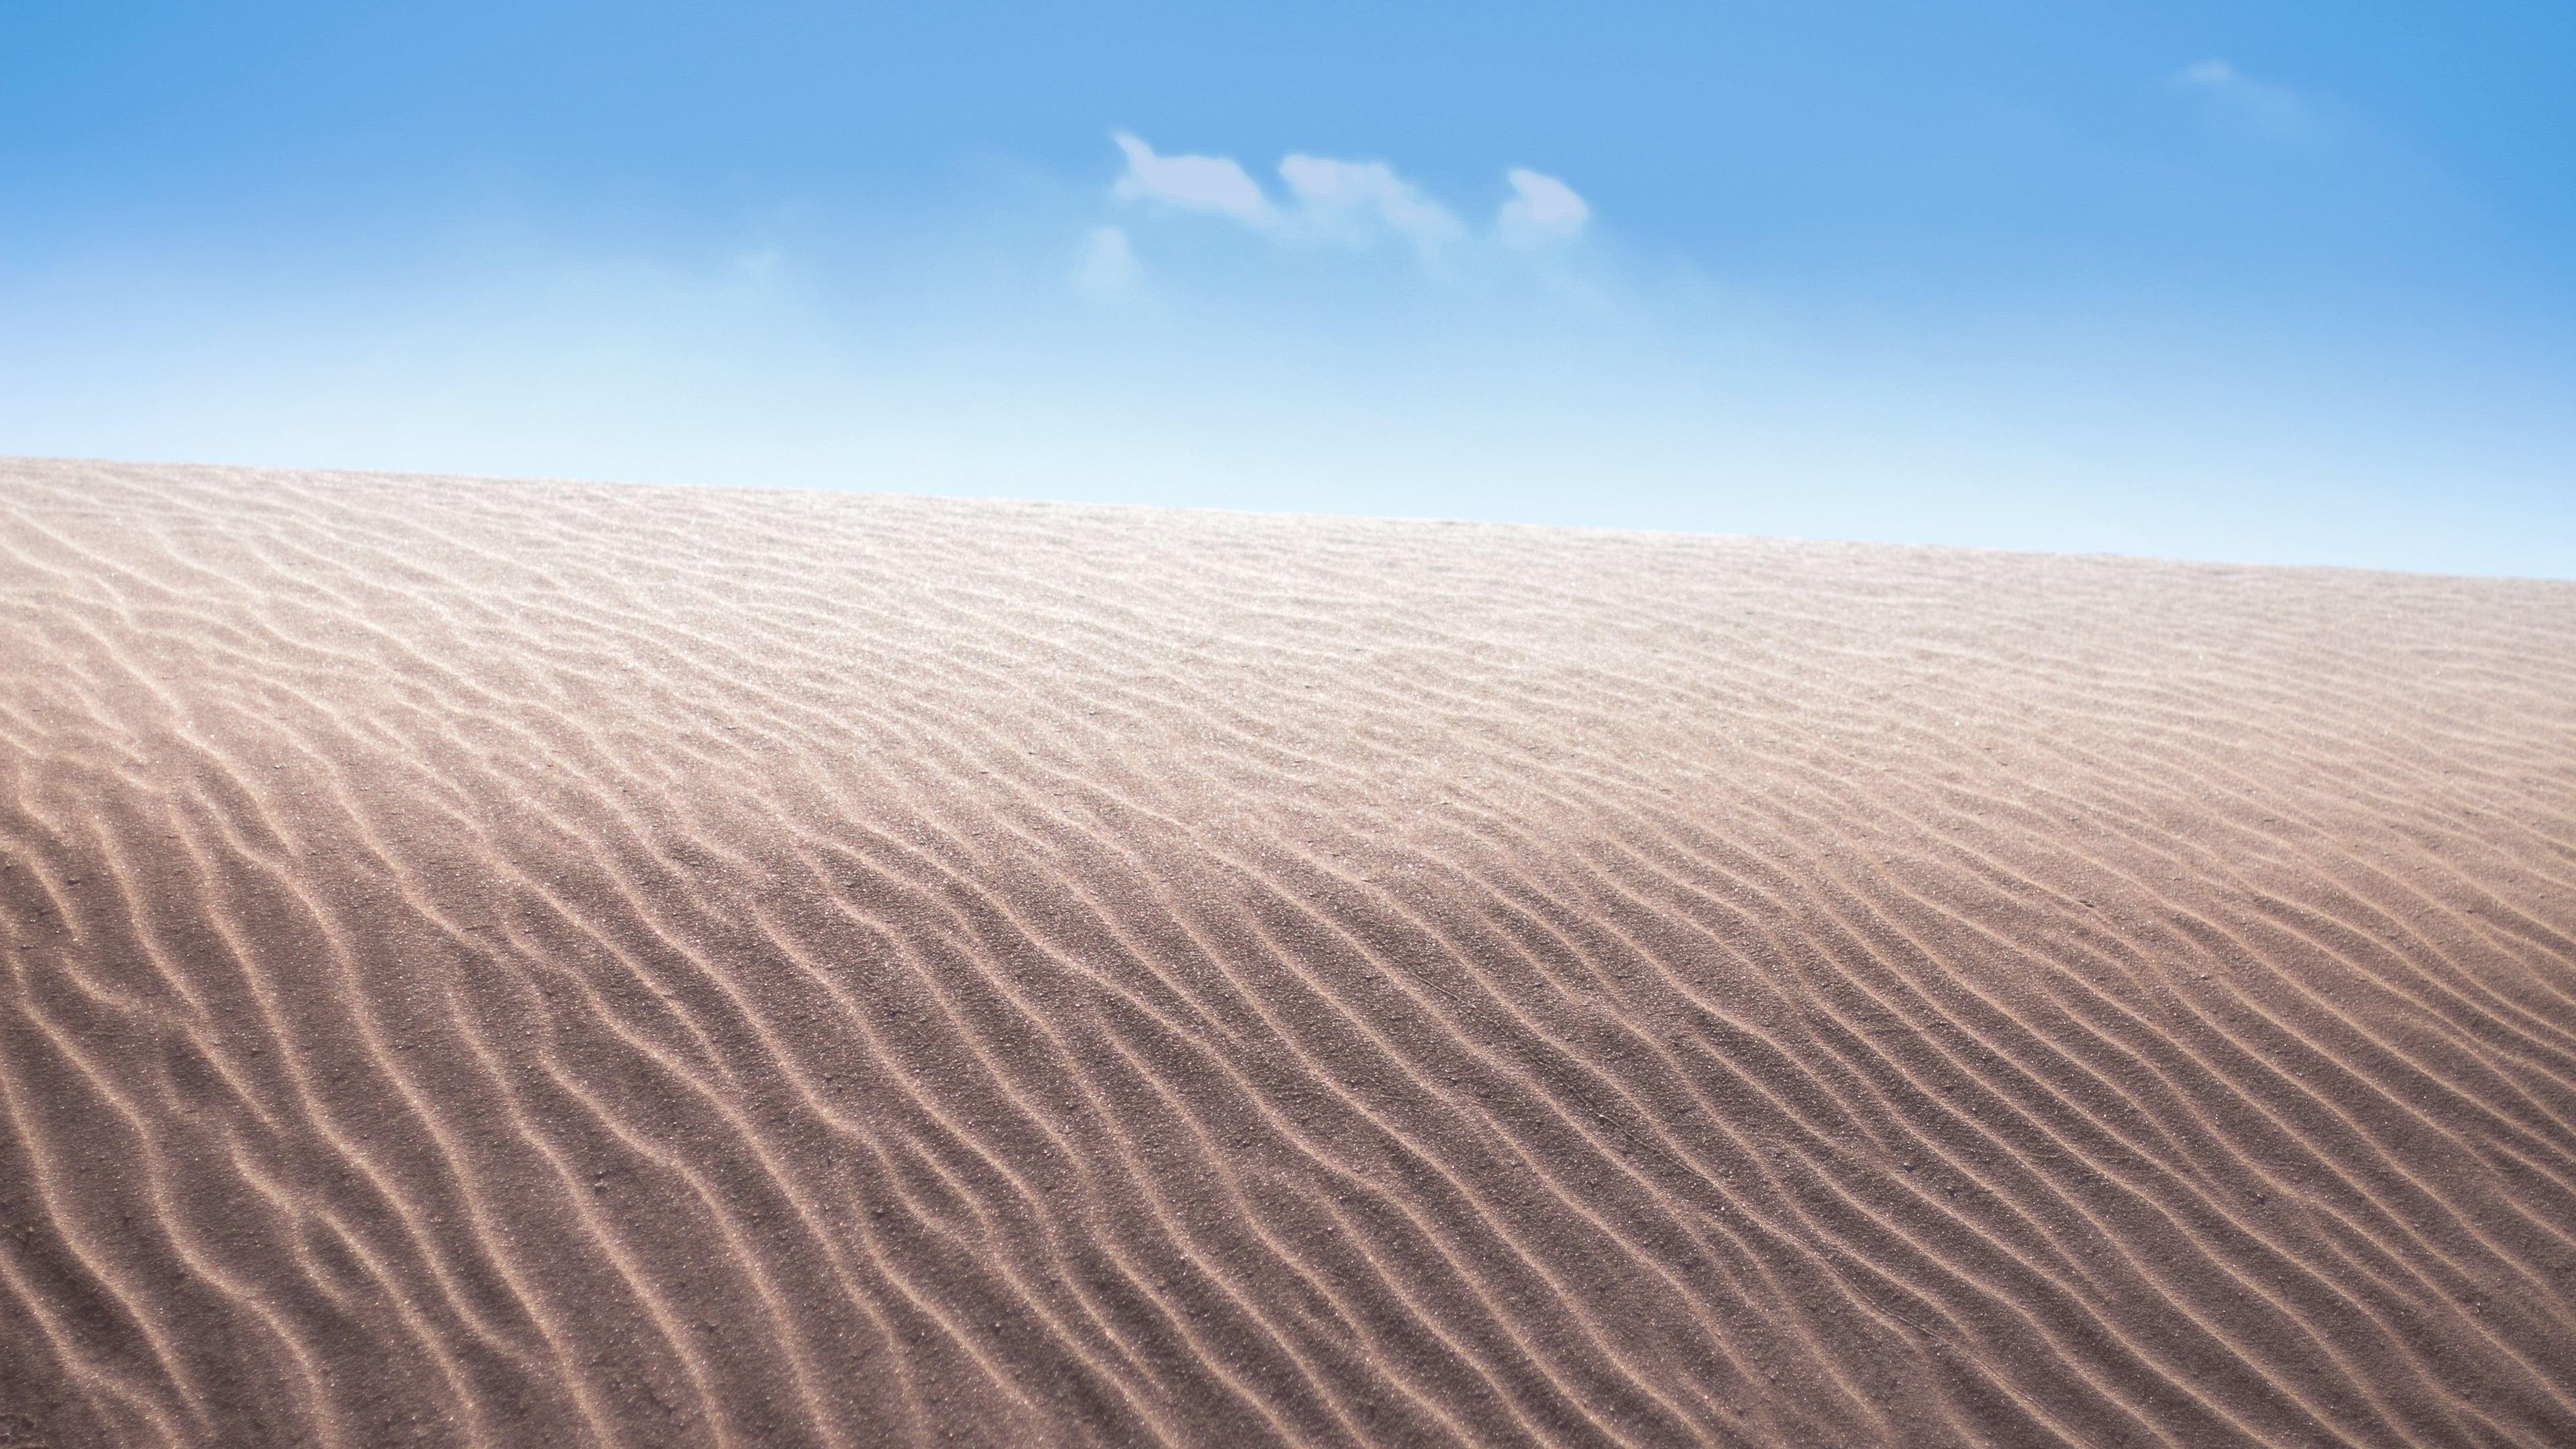 desert dune wave 1540140939 - Desert Dune Wave - wave wallpapers, nature wallpapers, hd-wallpapers, dune wallpapers, desert wallpapers, 5k wallpapers, 4k-wallpapers